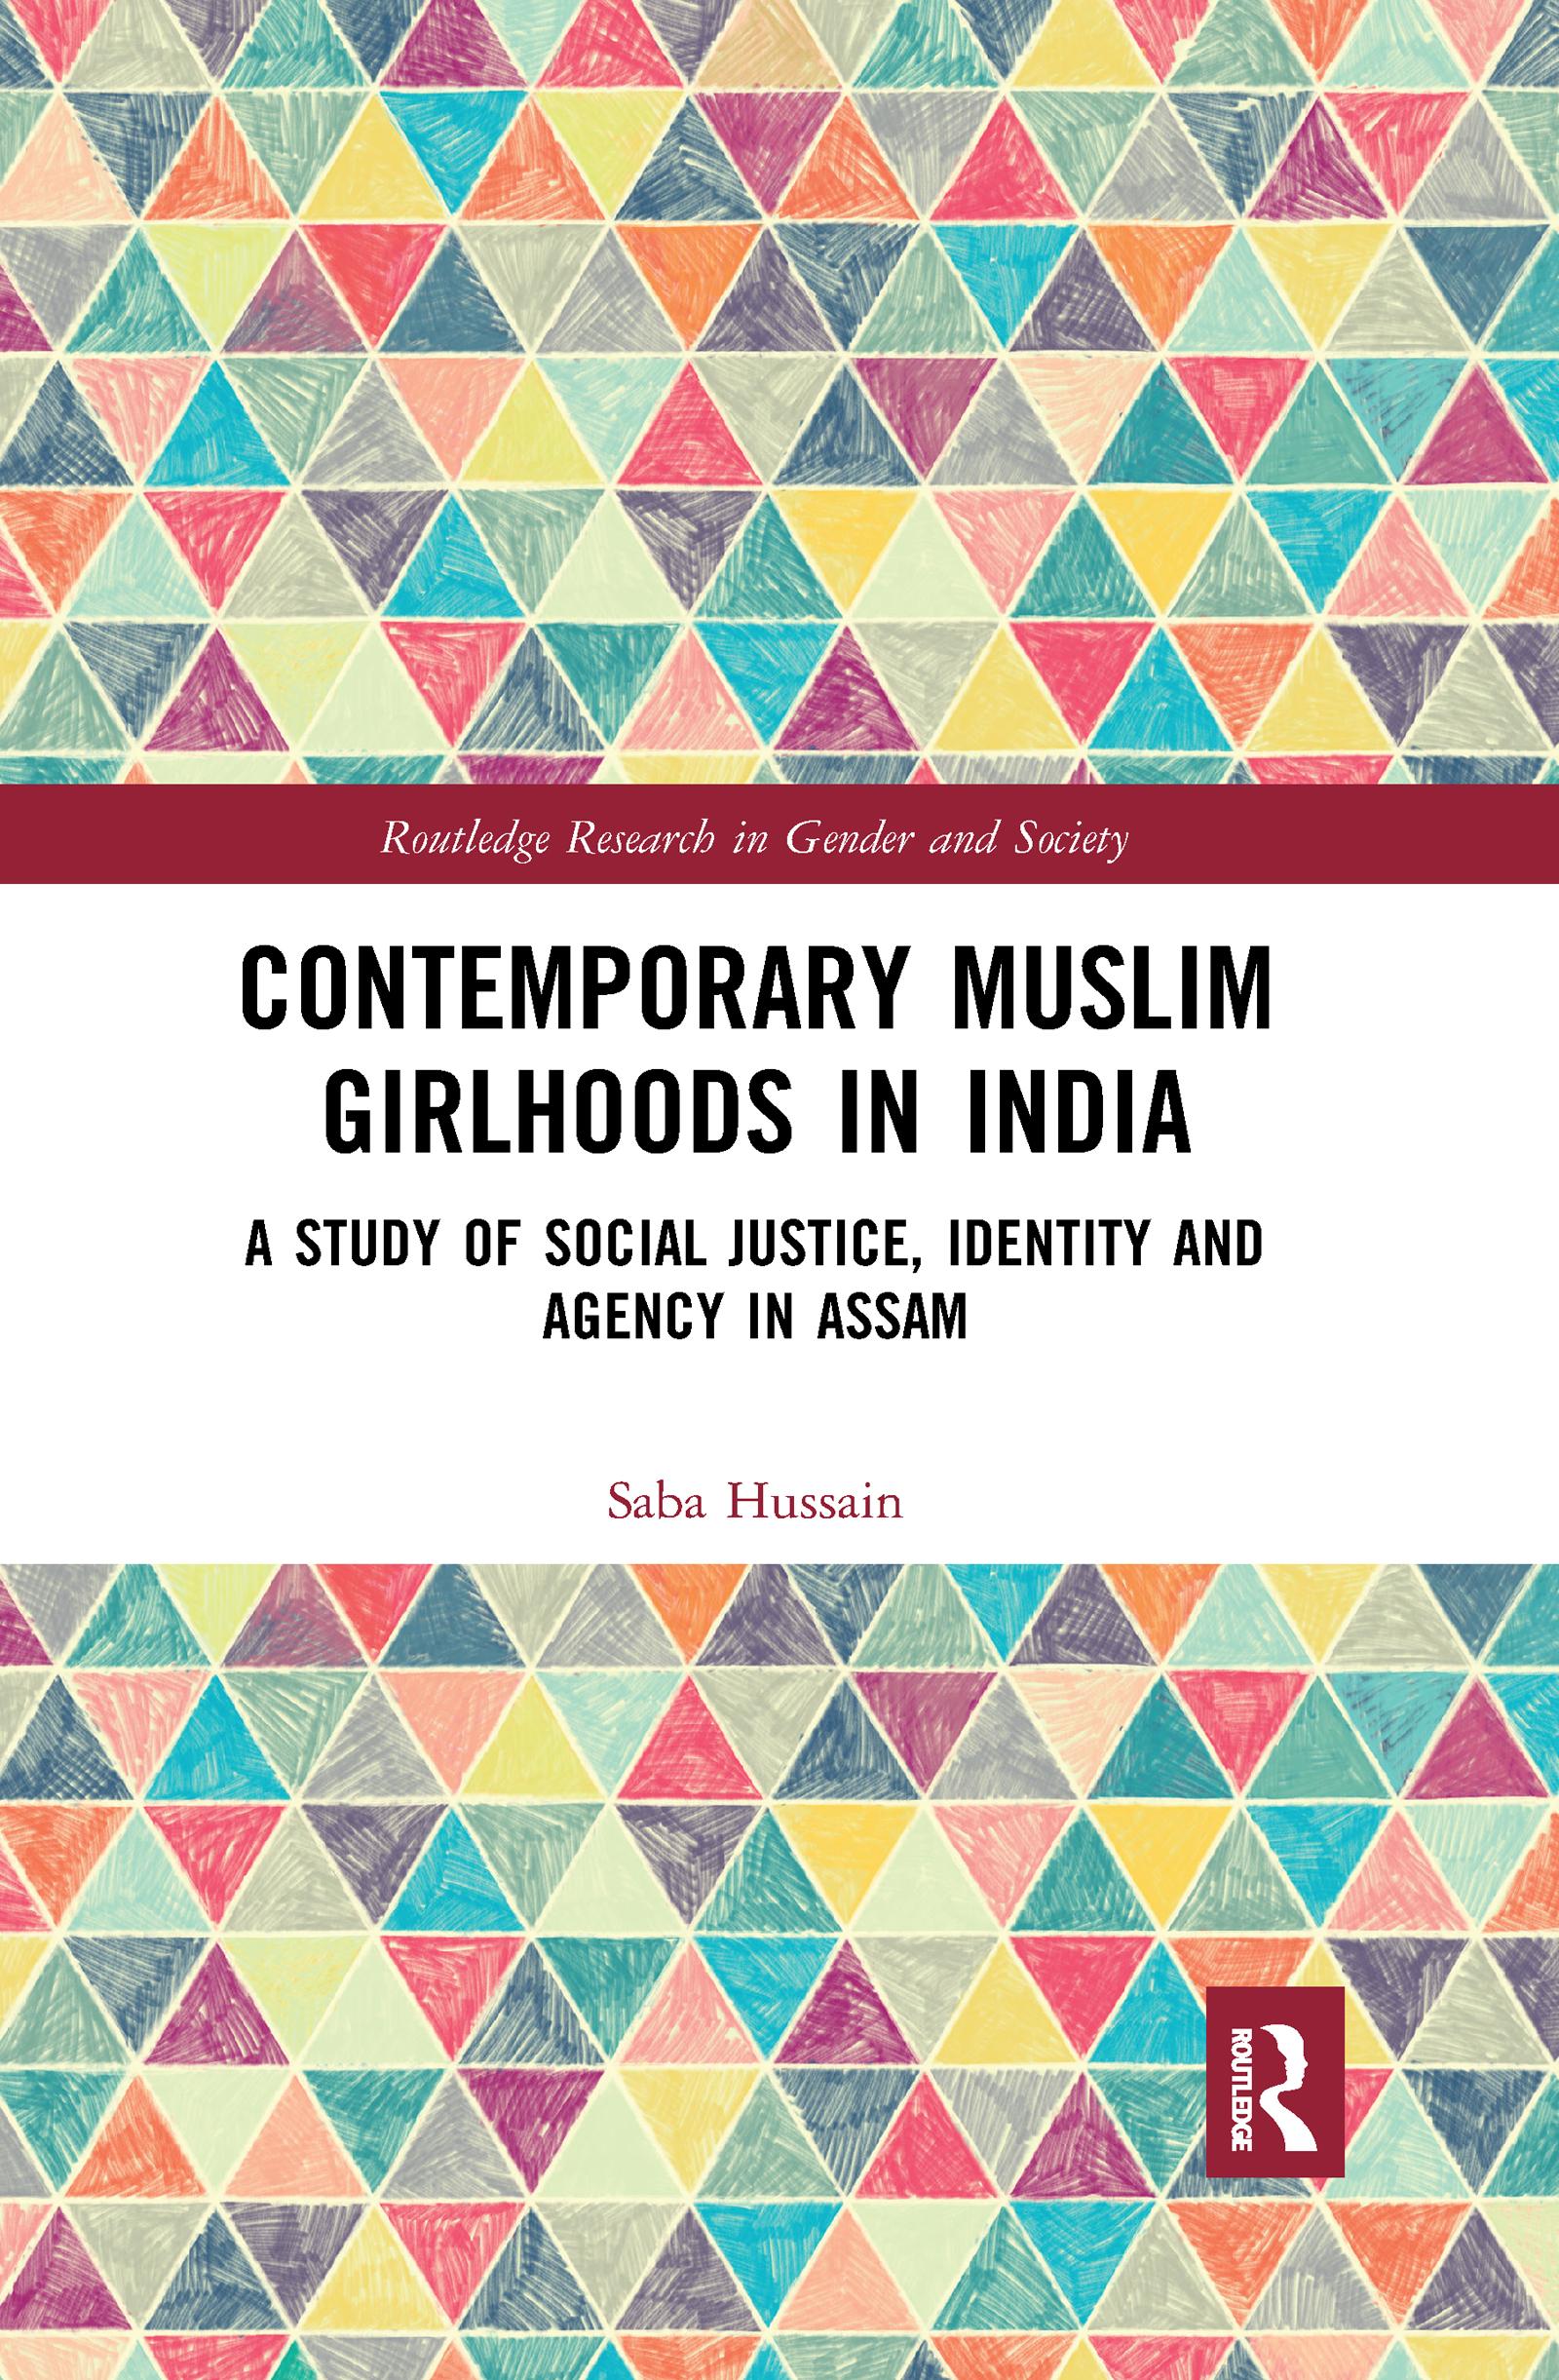 Contemporary Muslim Girlhoods in India